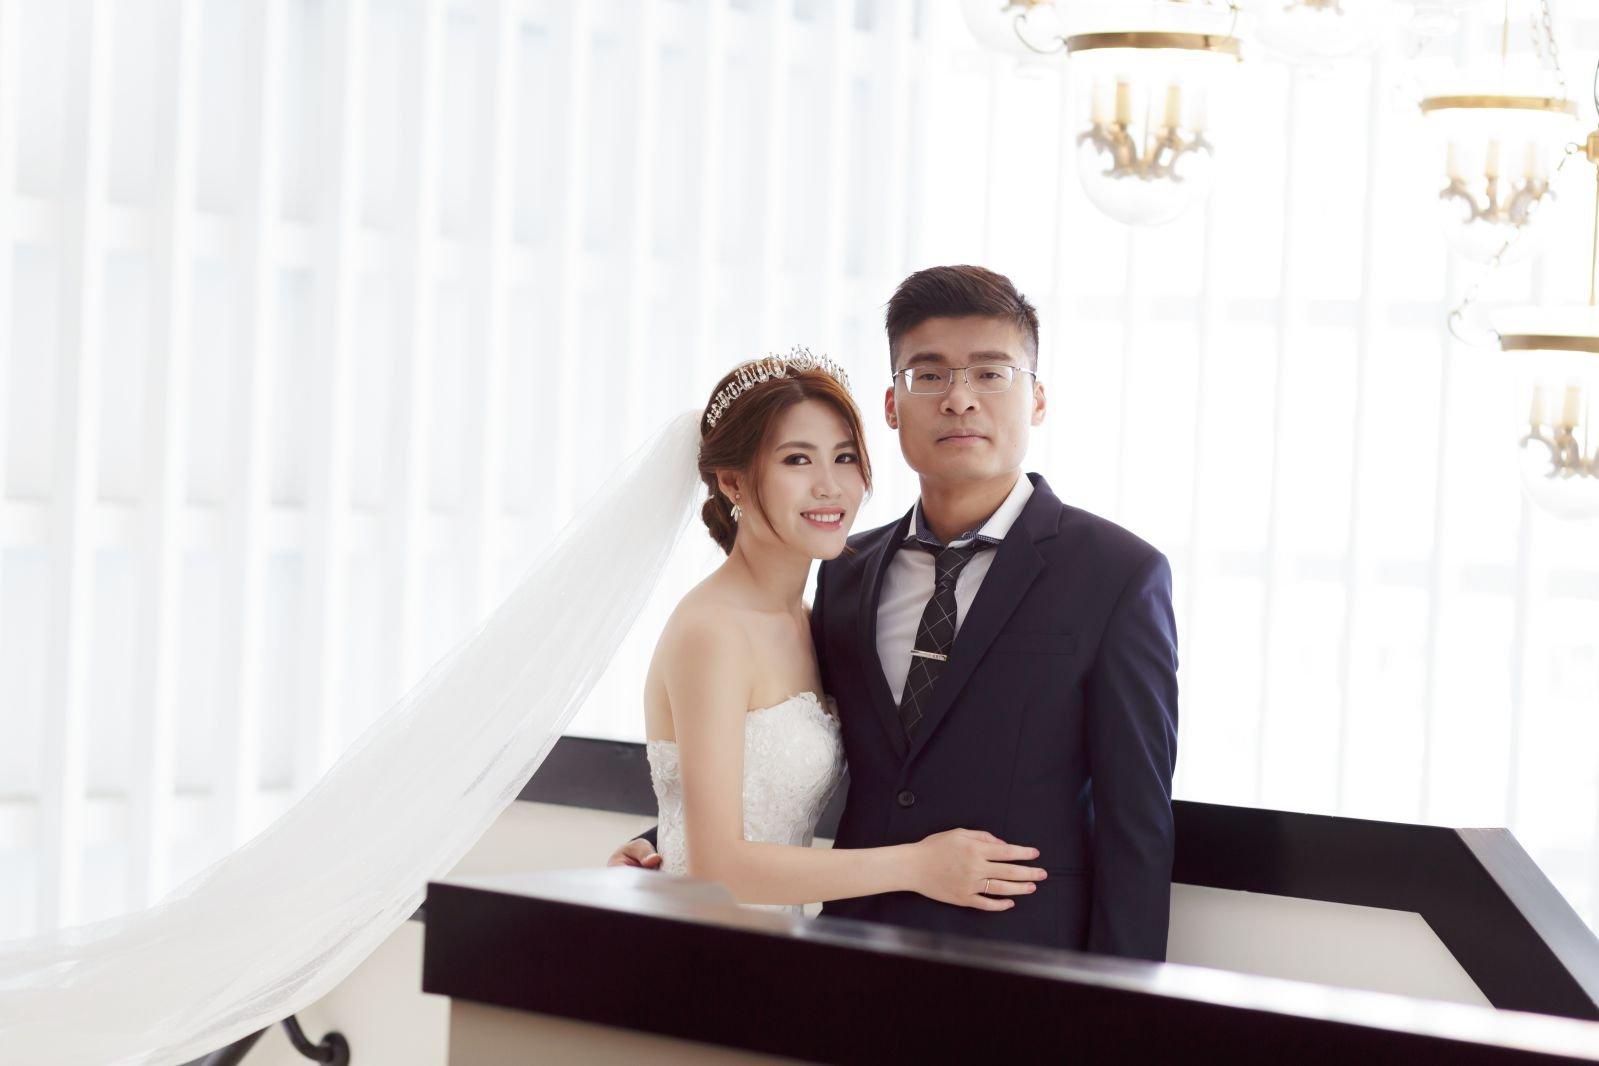 [2019 PTT婚攝推薦文] 高雄婚攝/婚攝森森-新人小芝 - 婚攝推薦ptt